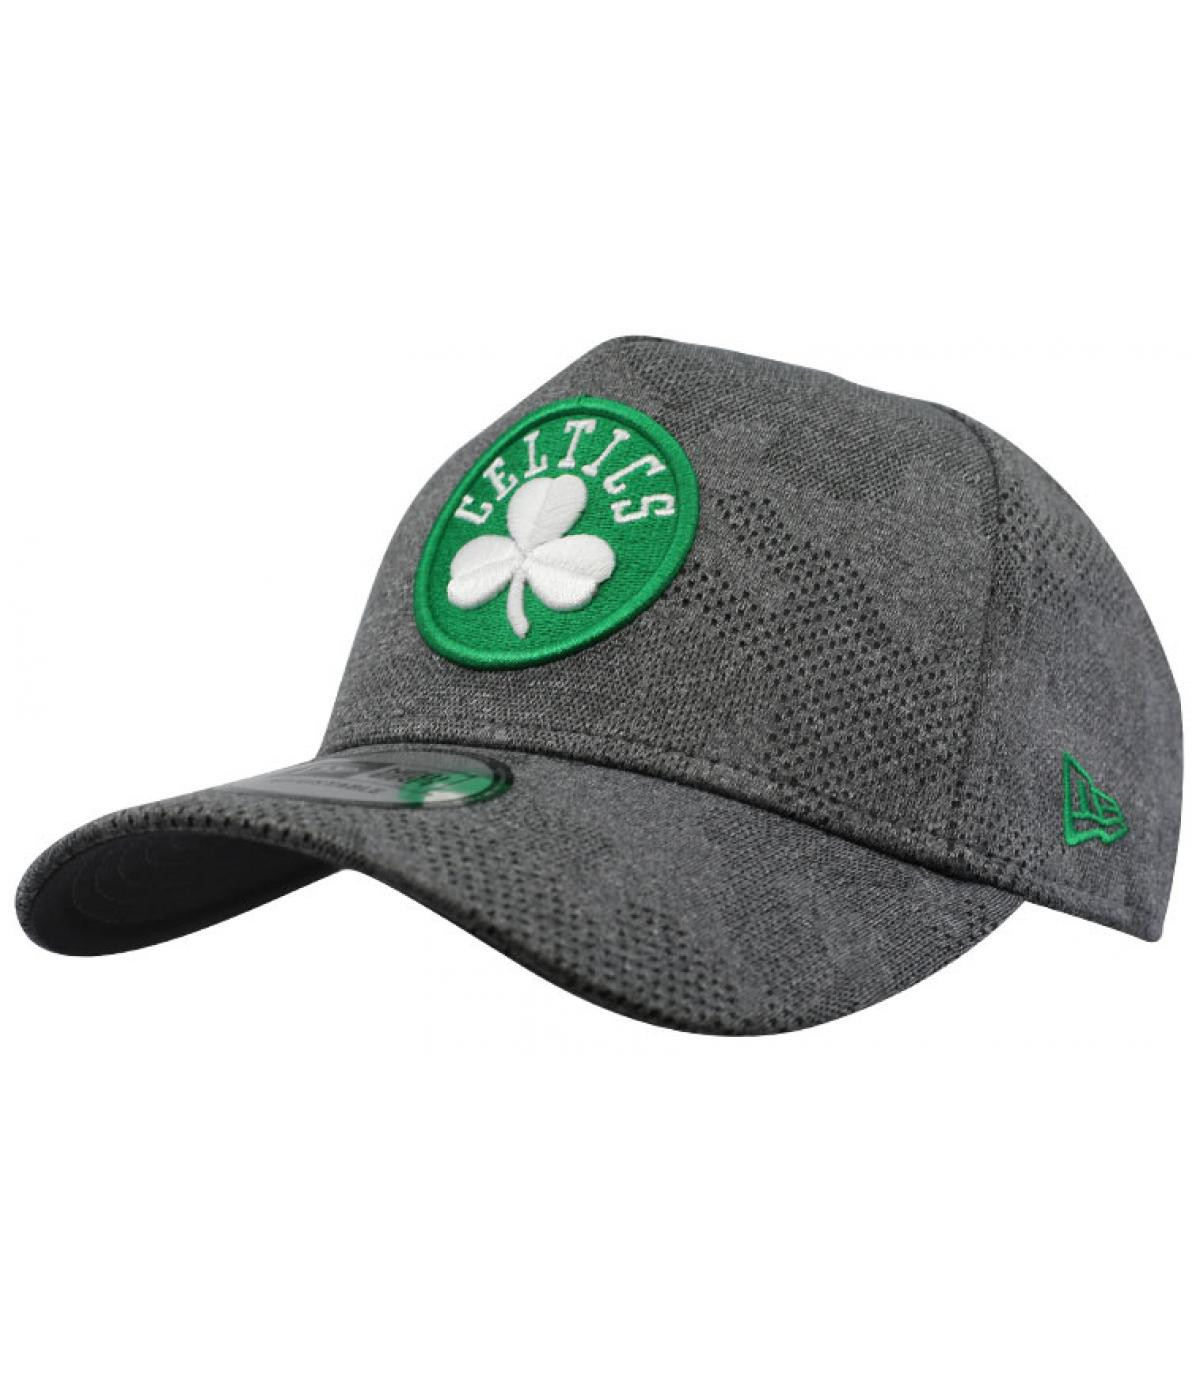 Detalles Enginneered Plus Celtics Aframe black imagen 2